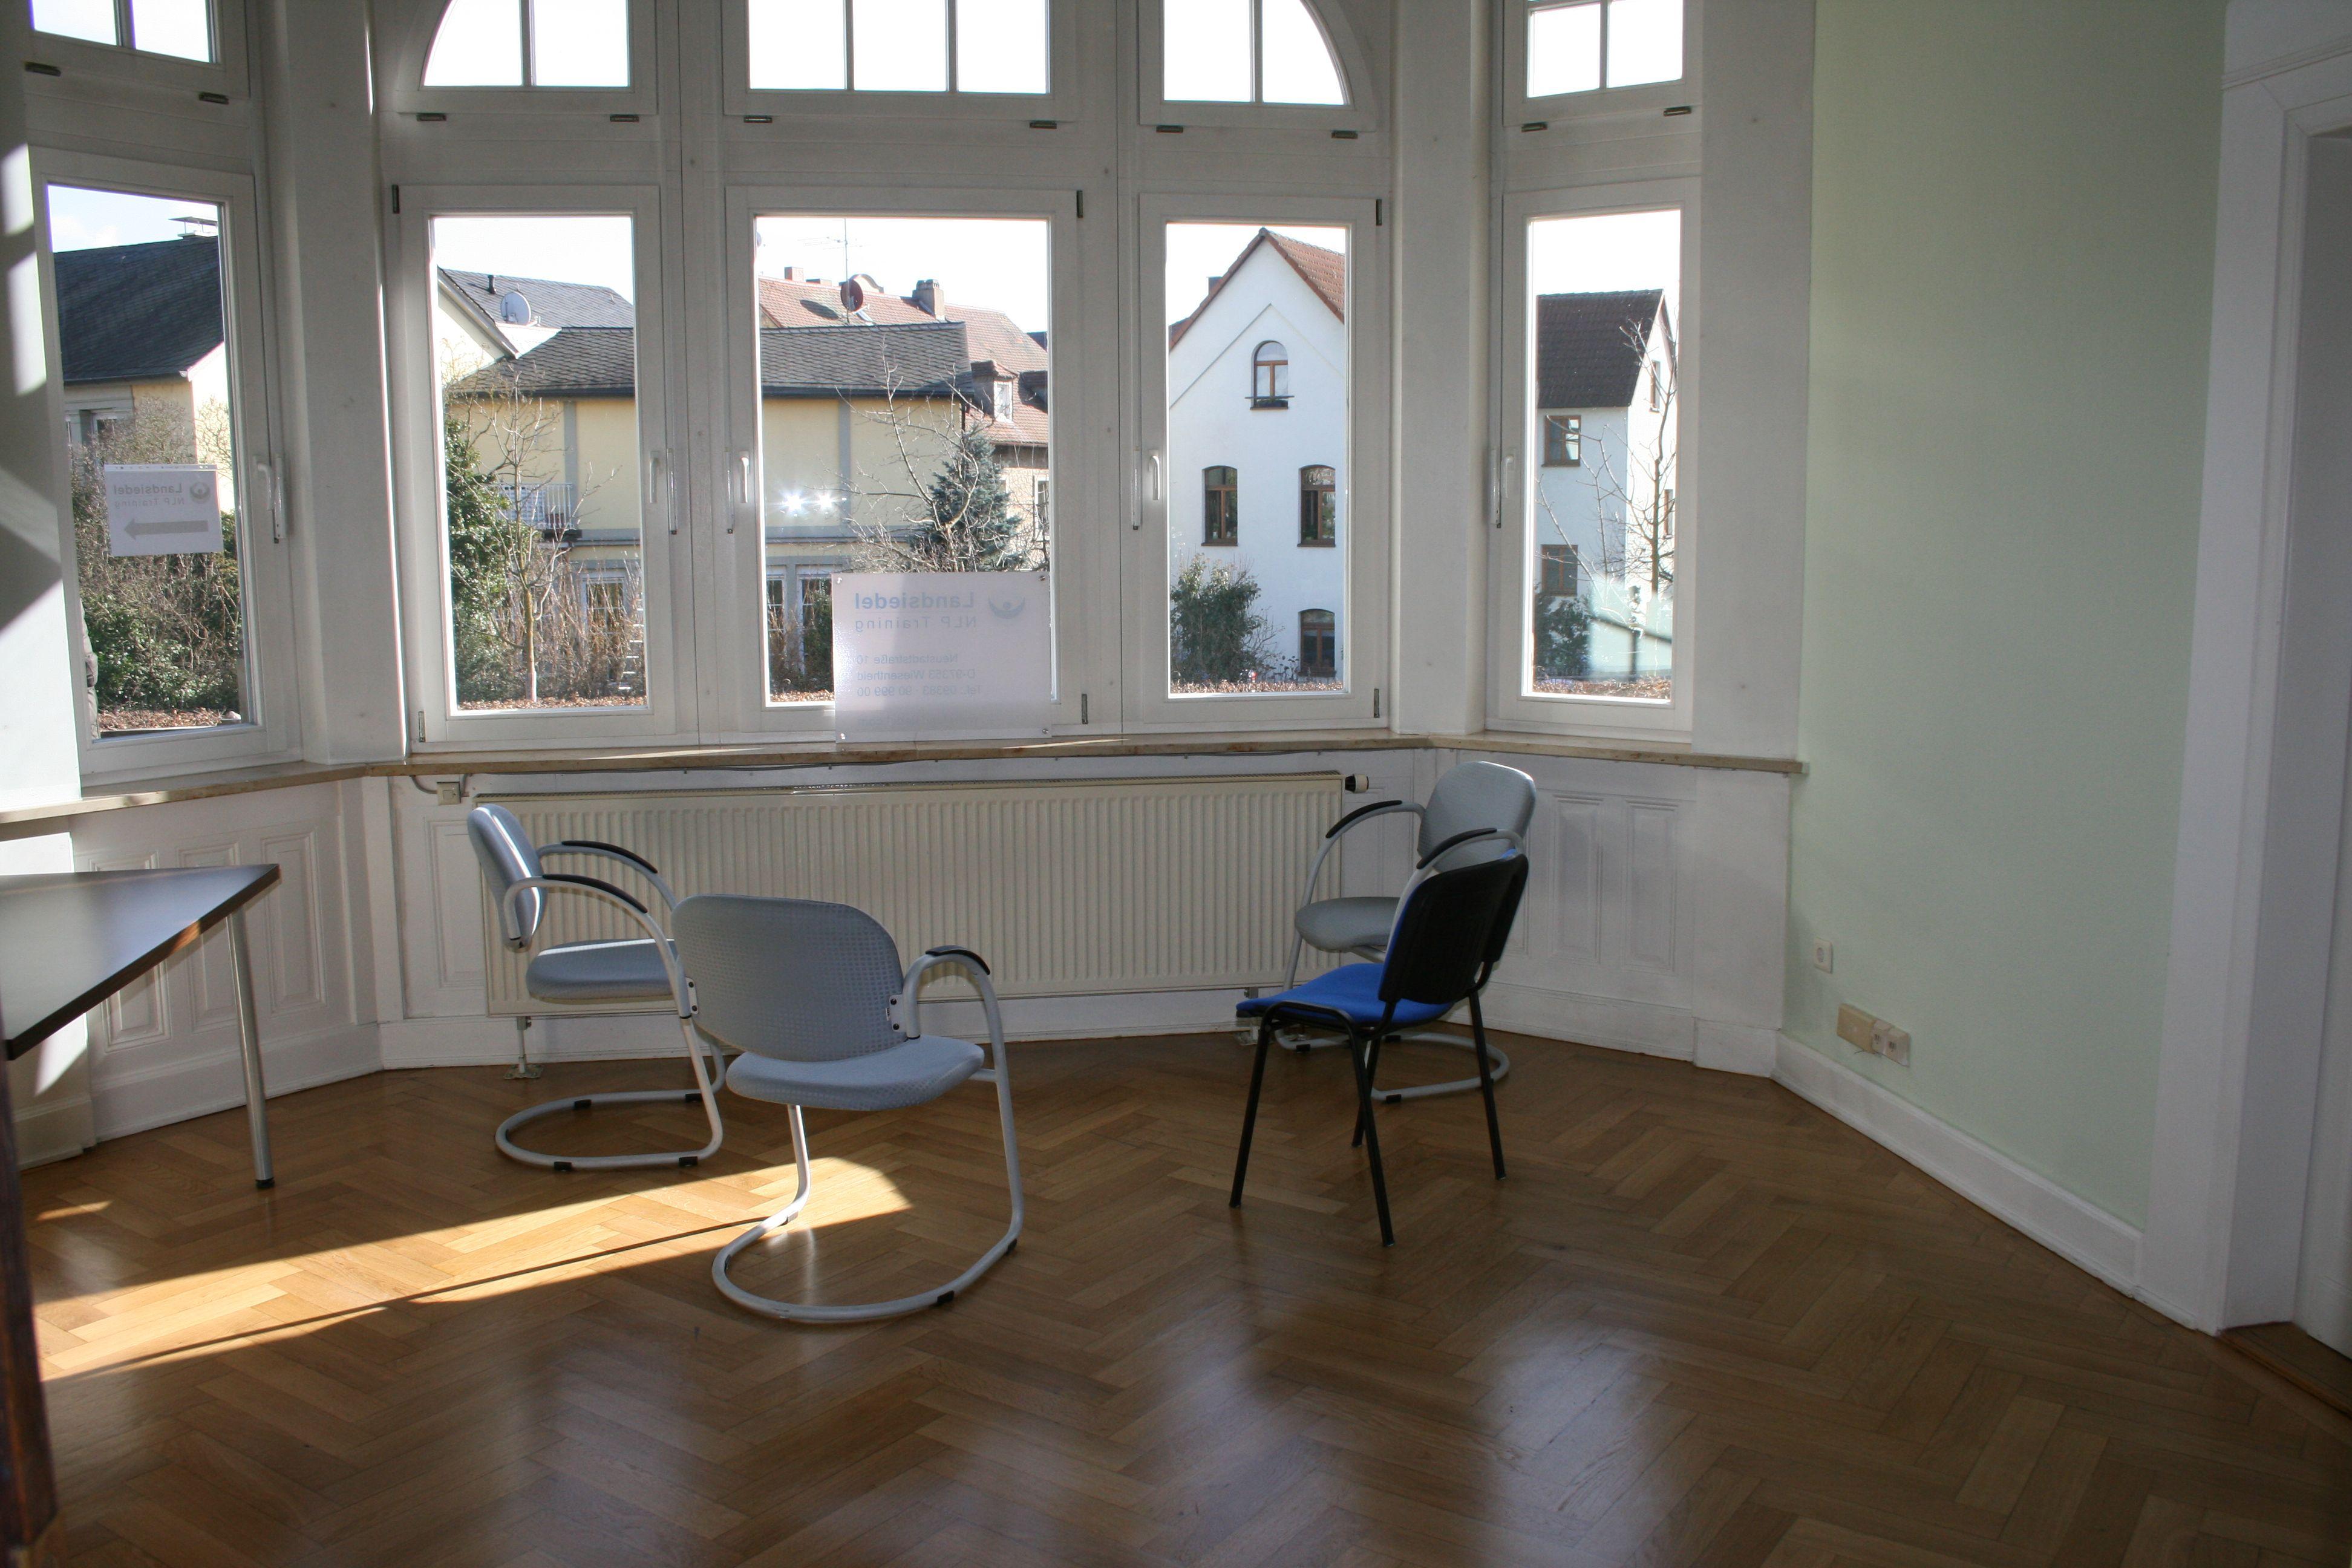 Übungsraum LNLPT Kitzingen